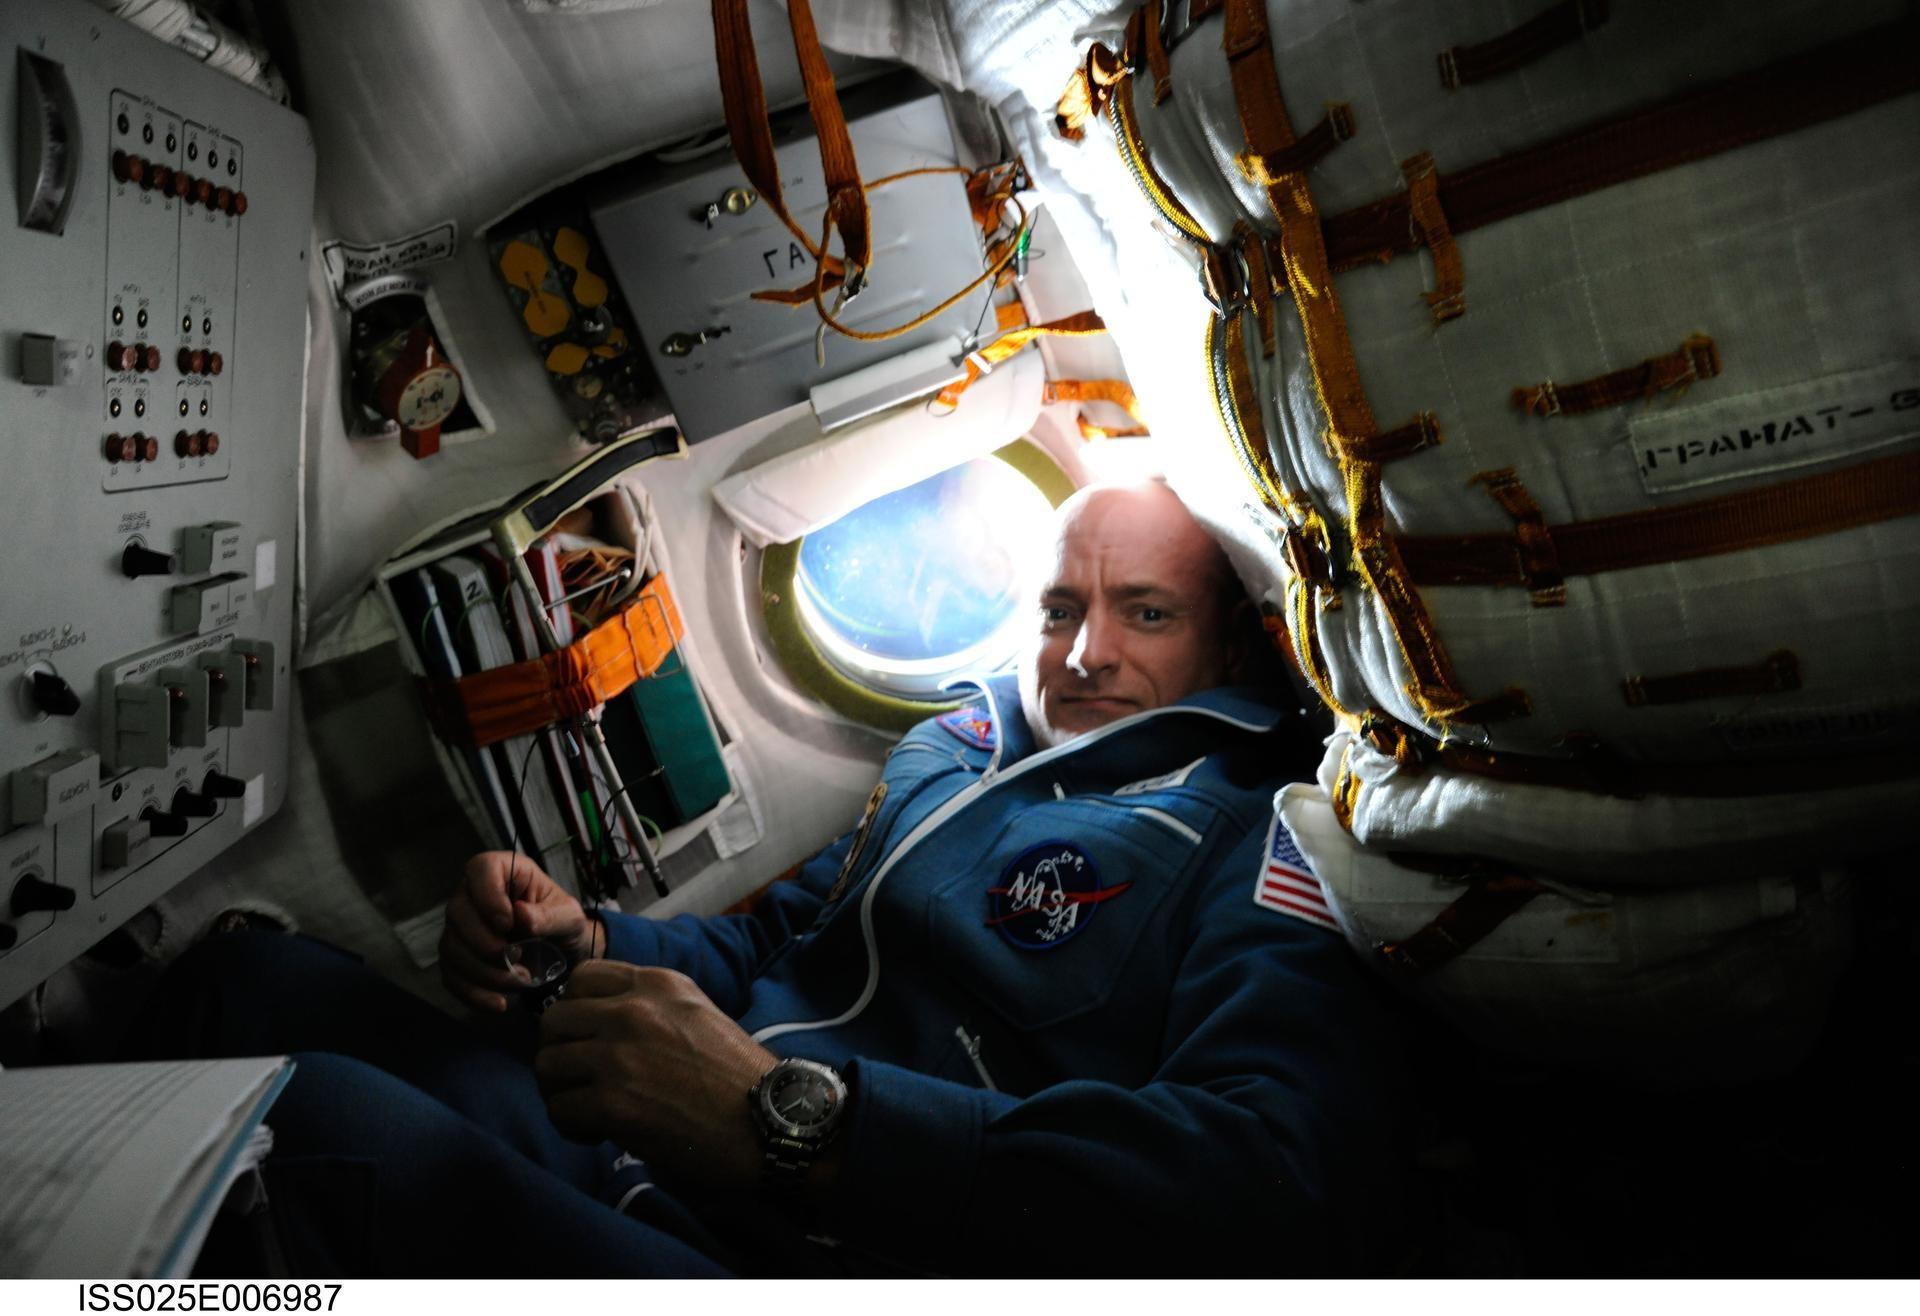 Scott Kelly, astronauta da NASA, dentro da Soyuz TMA-01M, em foto de outubro de 2010 (Foto: NASA)